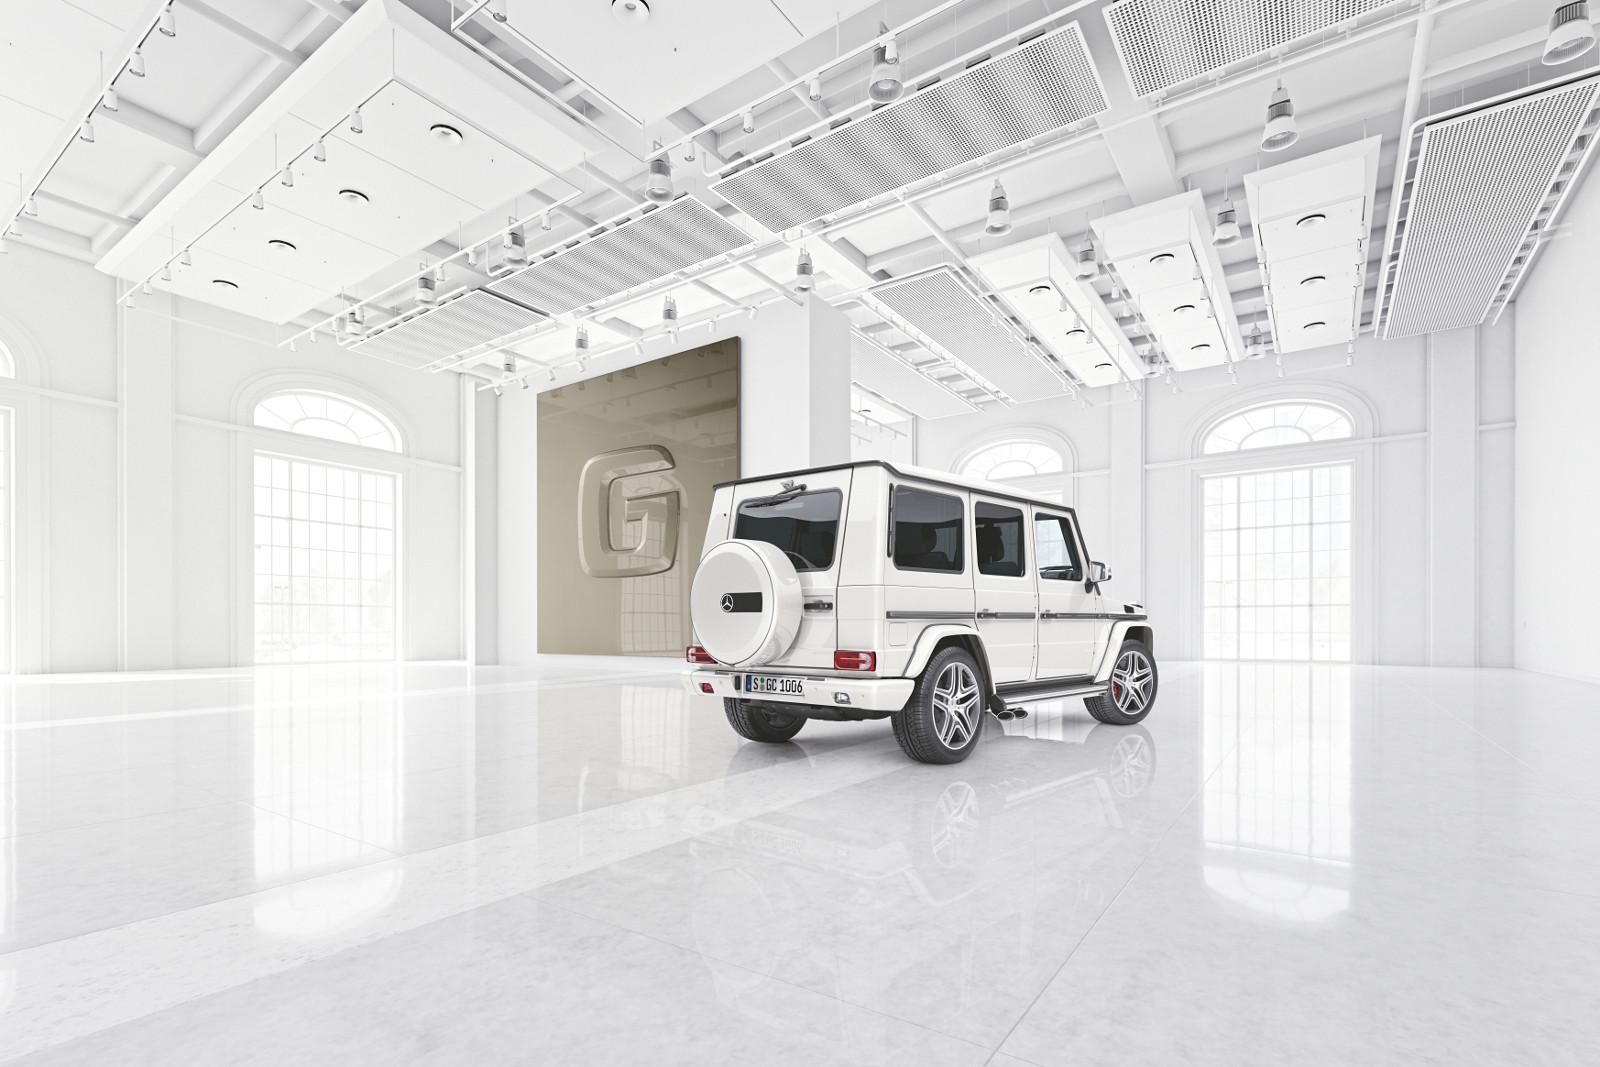 Mercedes Classe G Designo